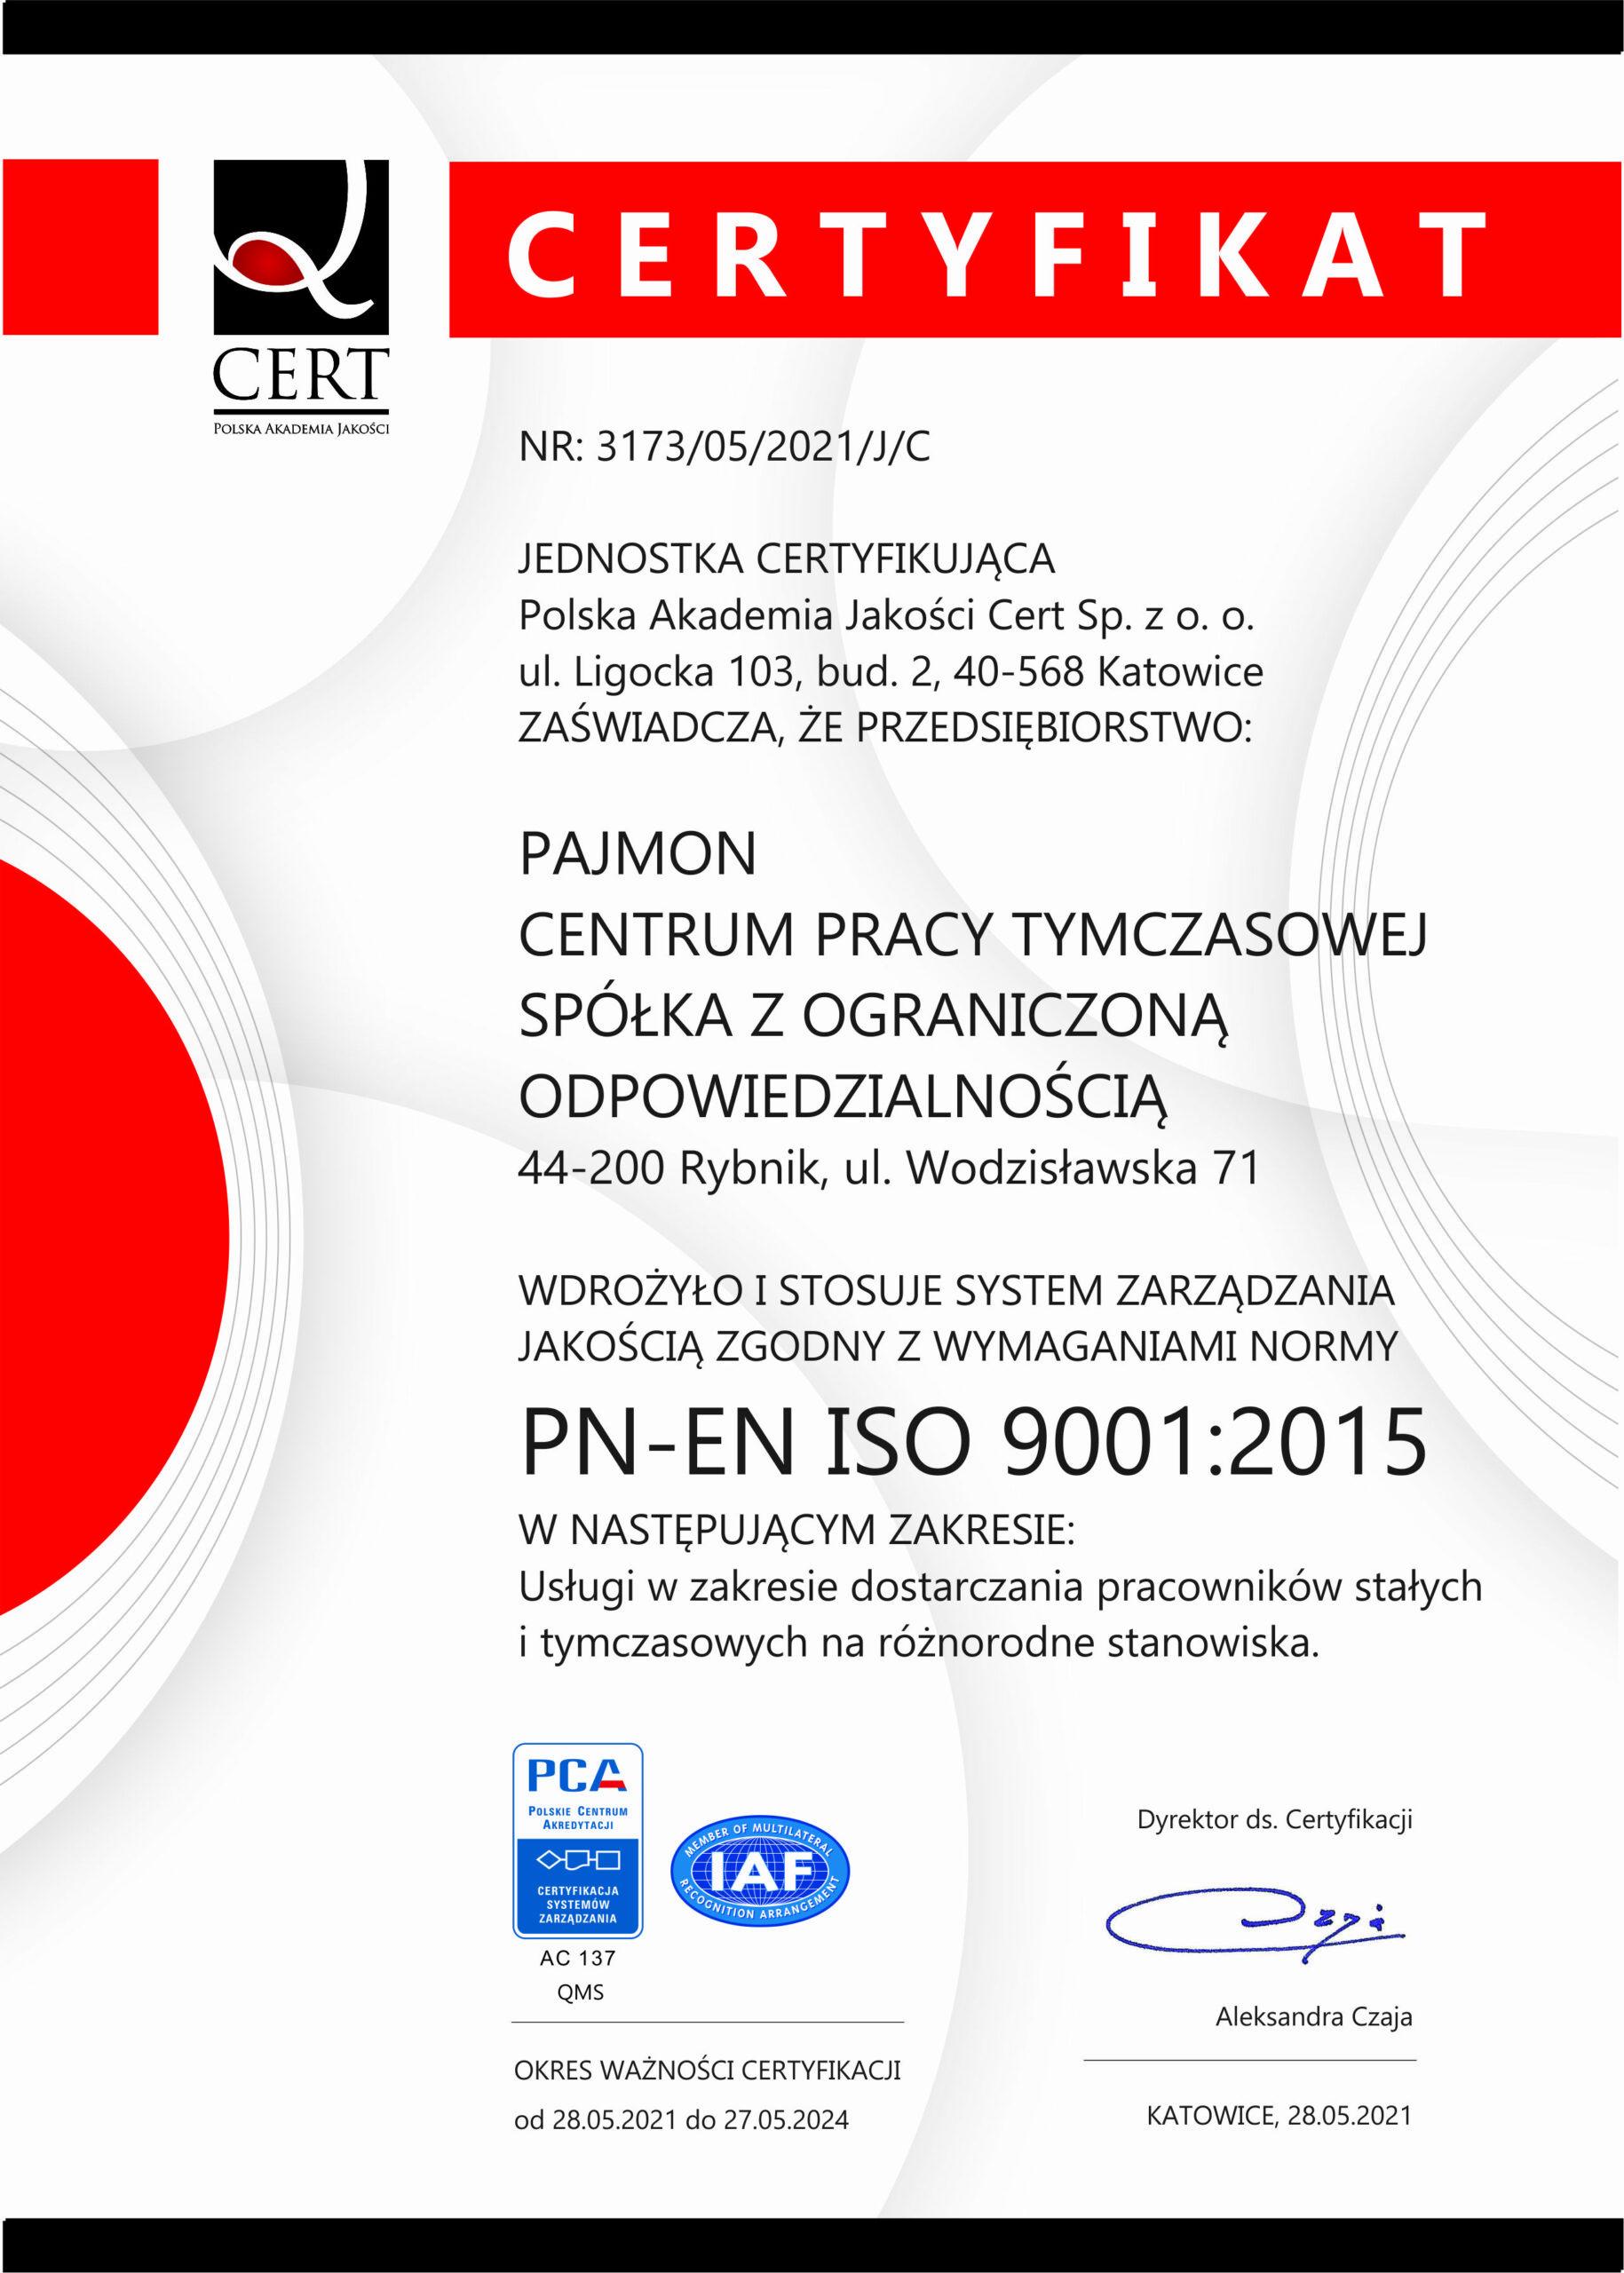 CERT Polska Akademia Jakości